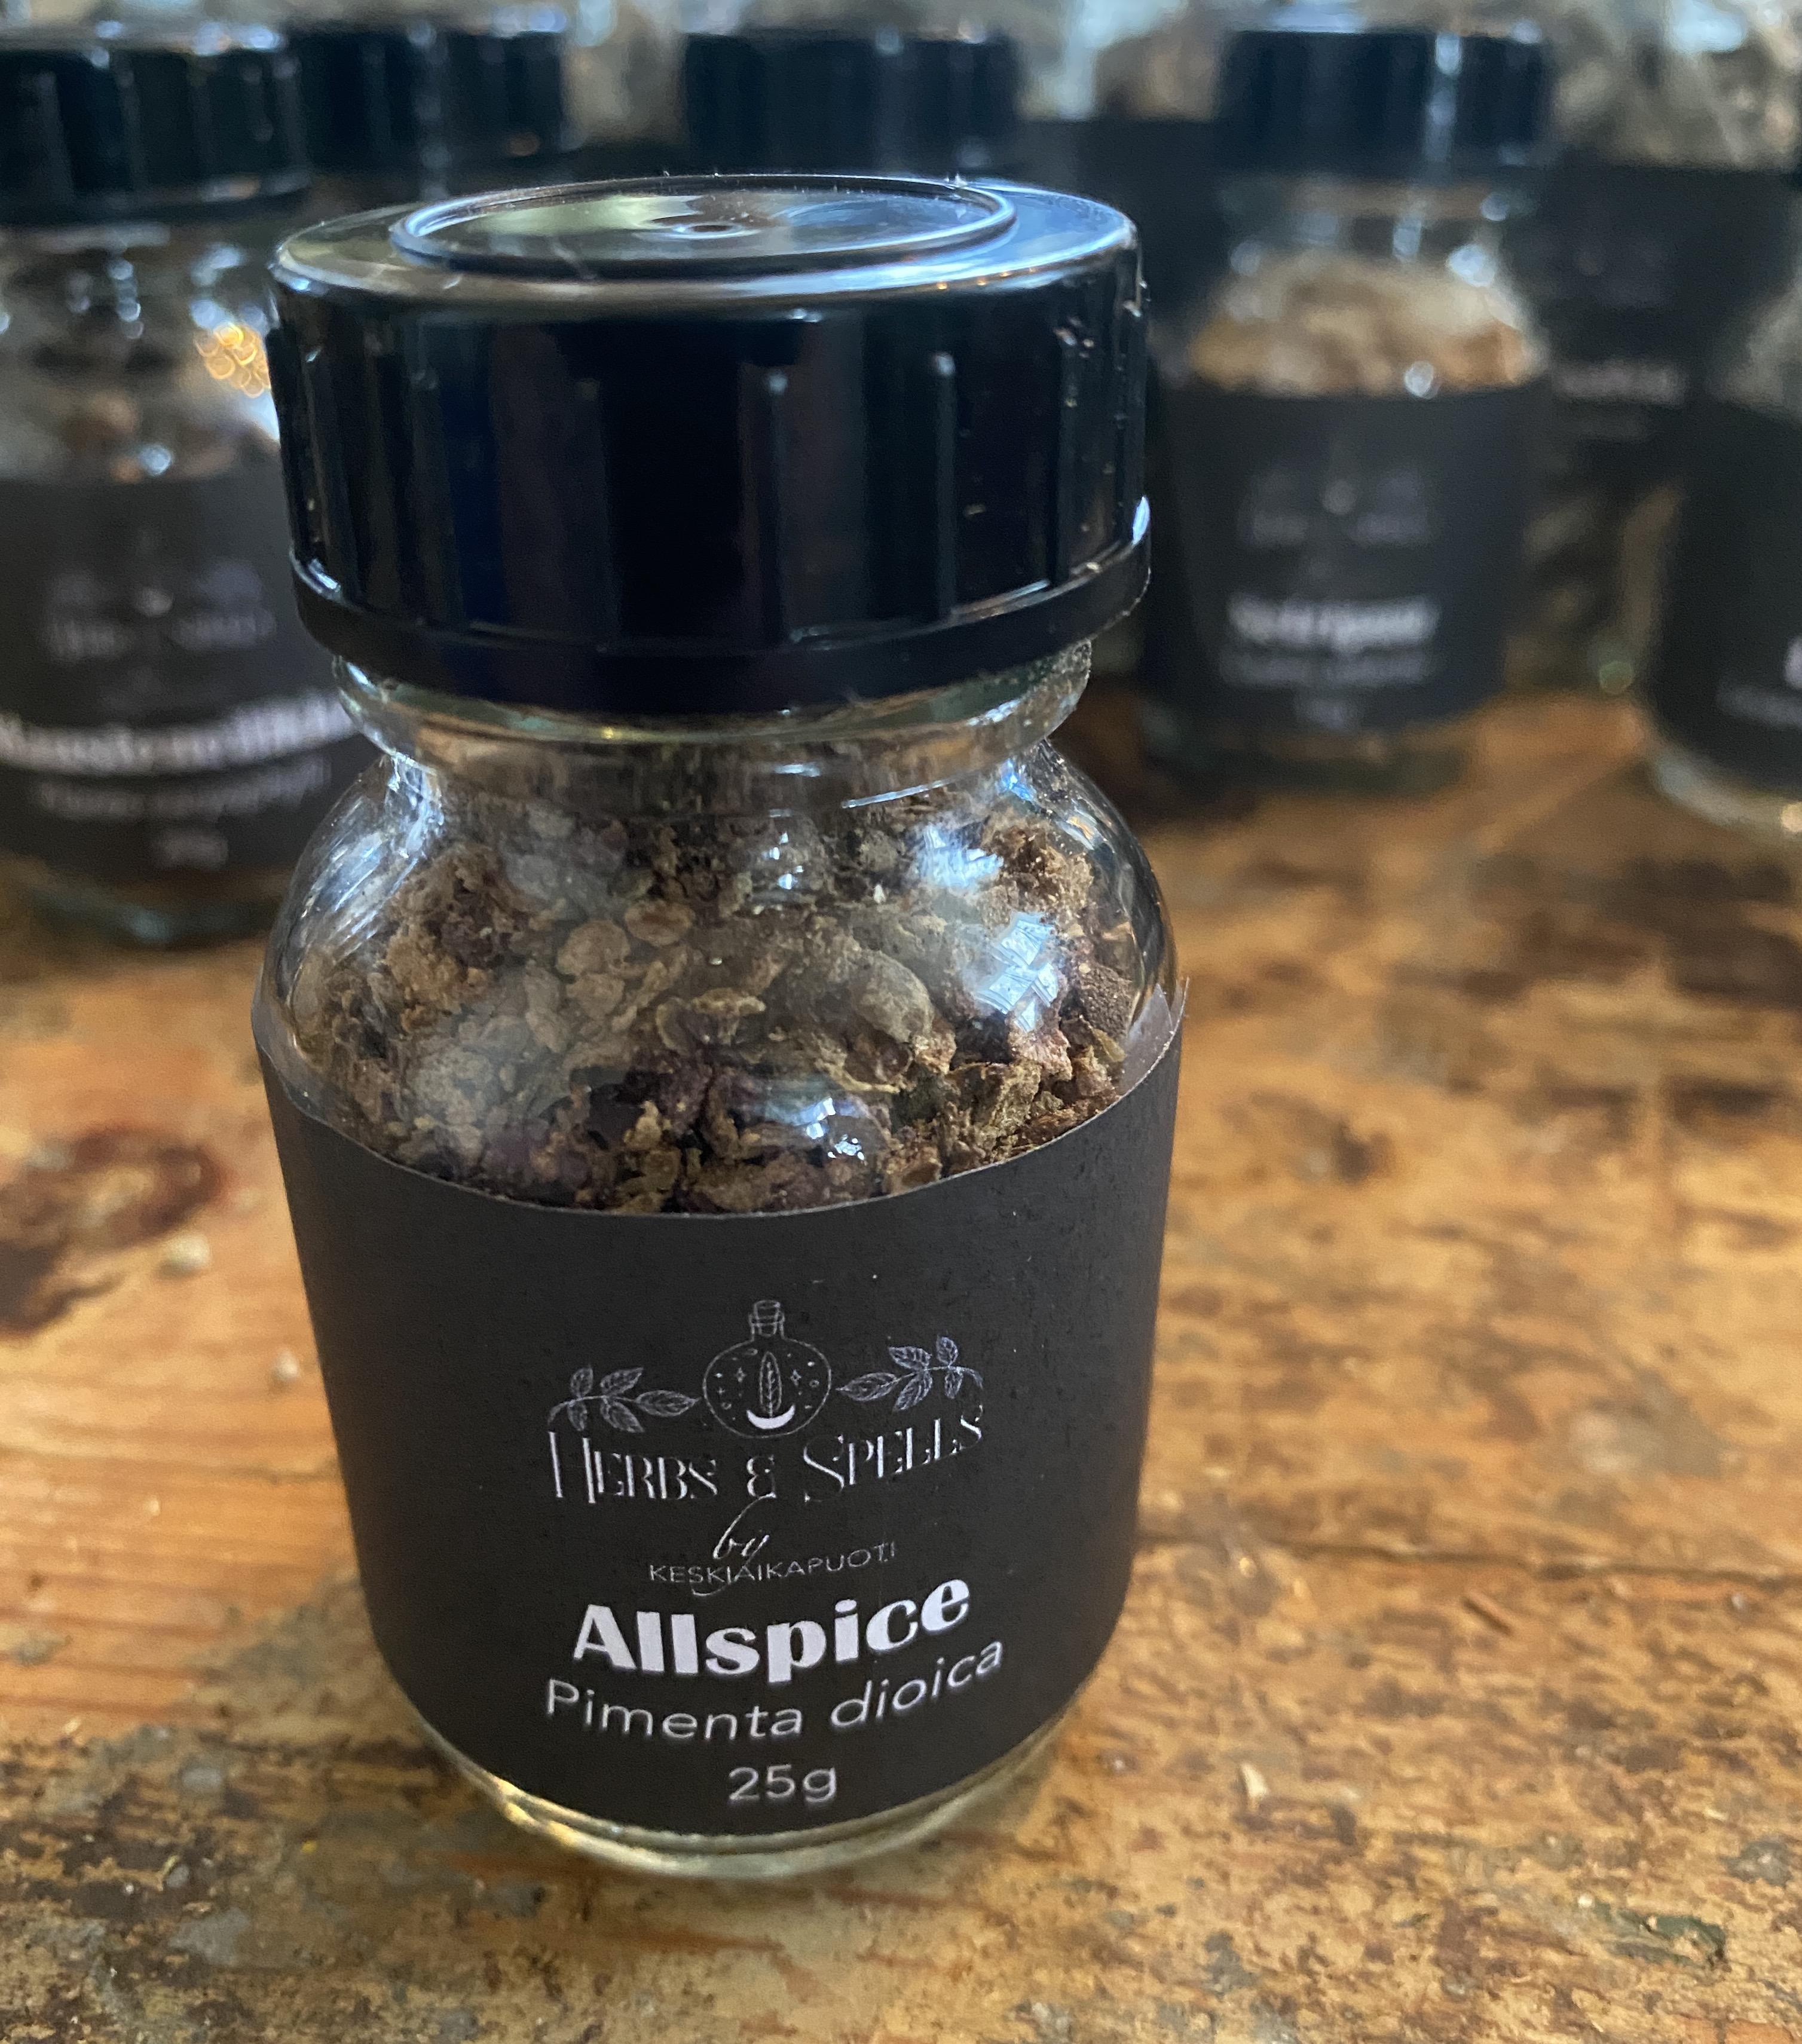 Allspice - Pimenta dioica 25g pullossa (Herbs&Spell by keskiaikapuoti)